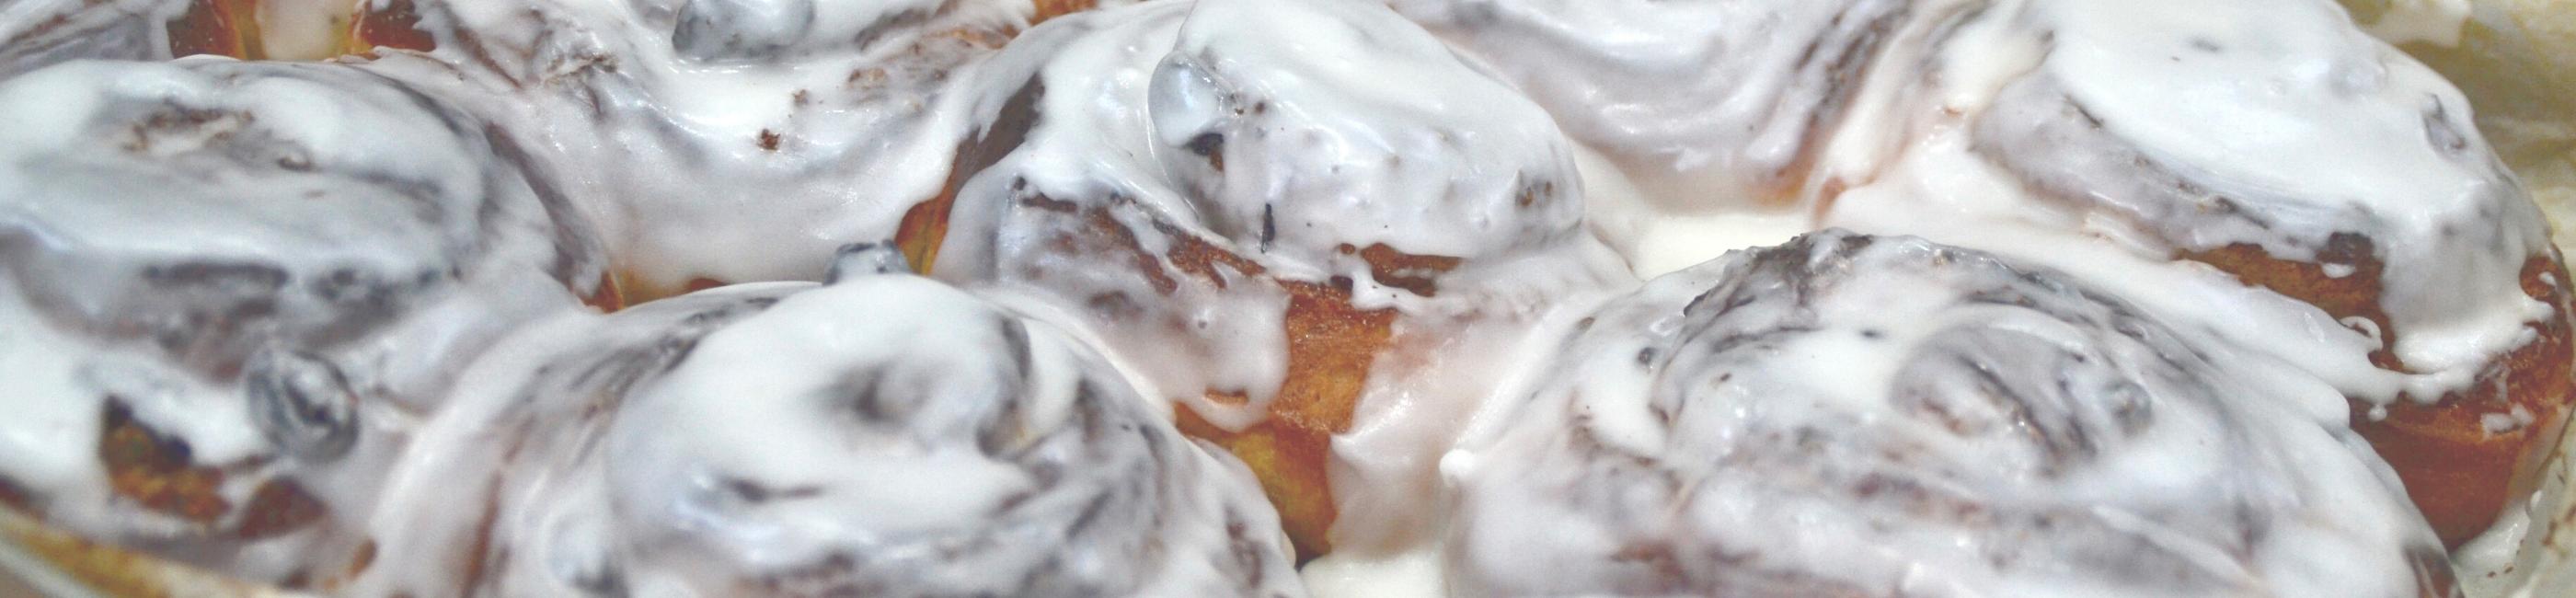 Foodie Friday Cinnamon Bun Recipe Giveaway!